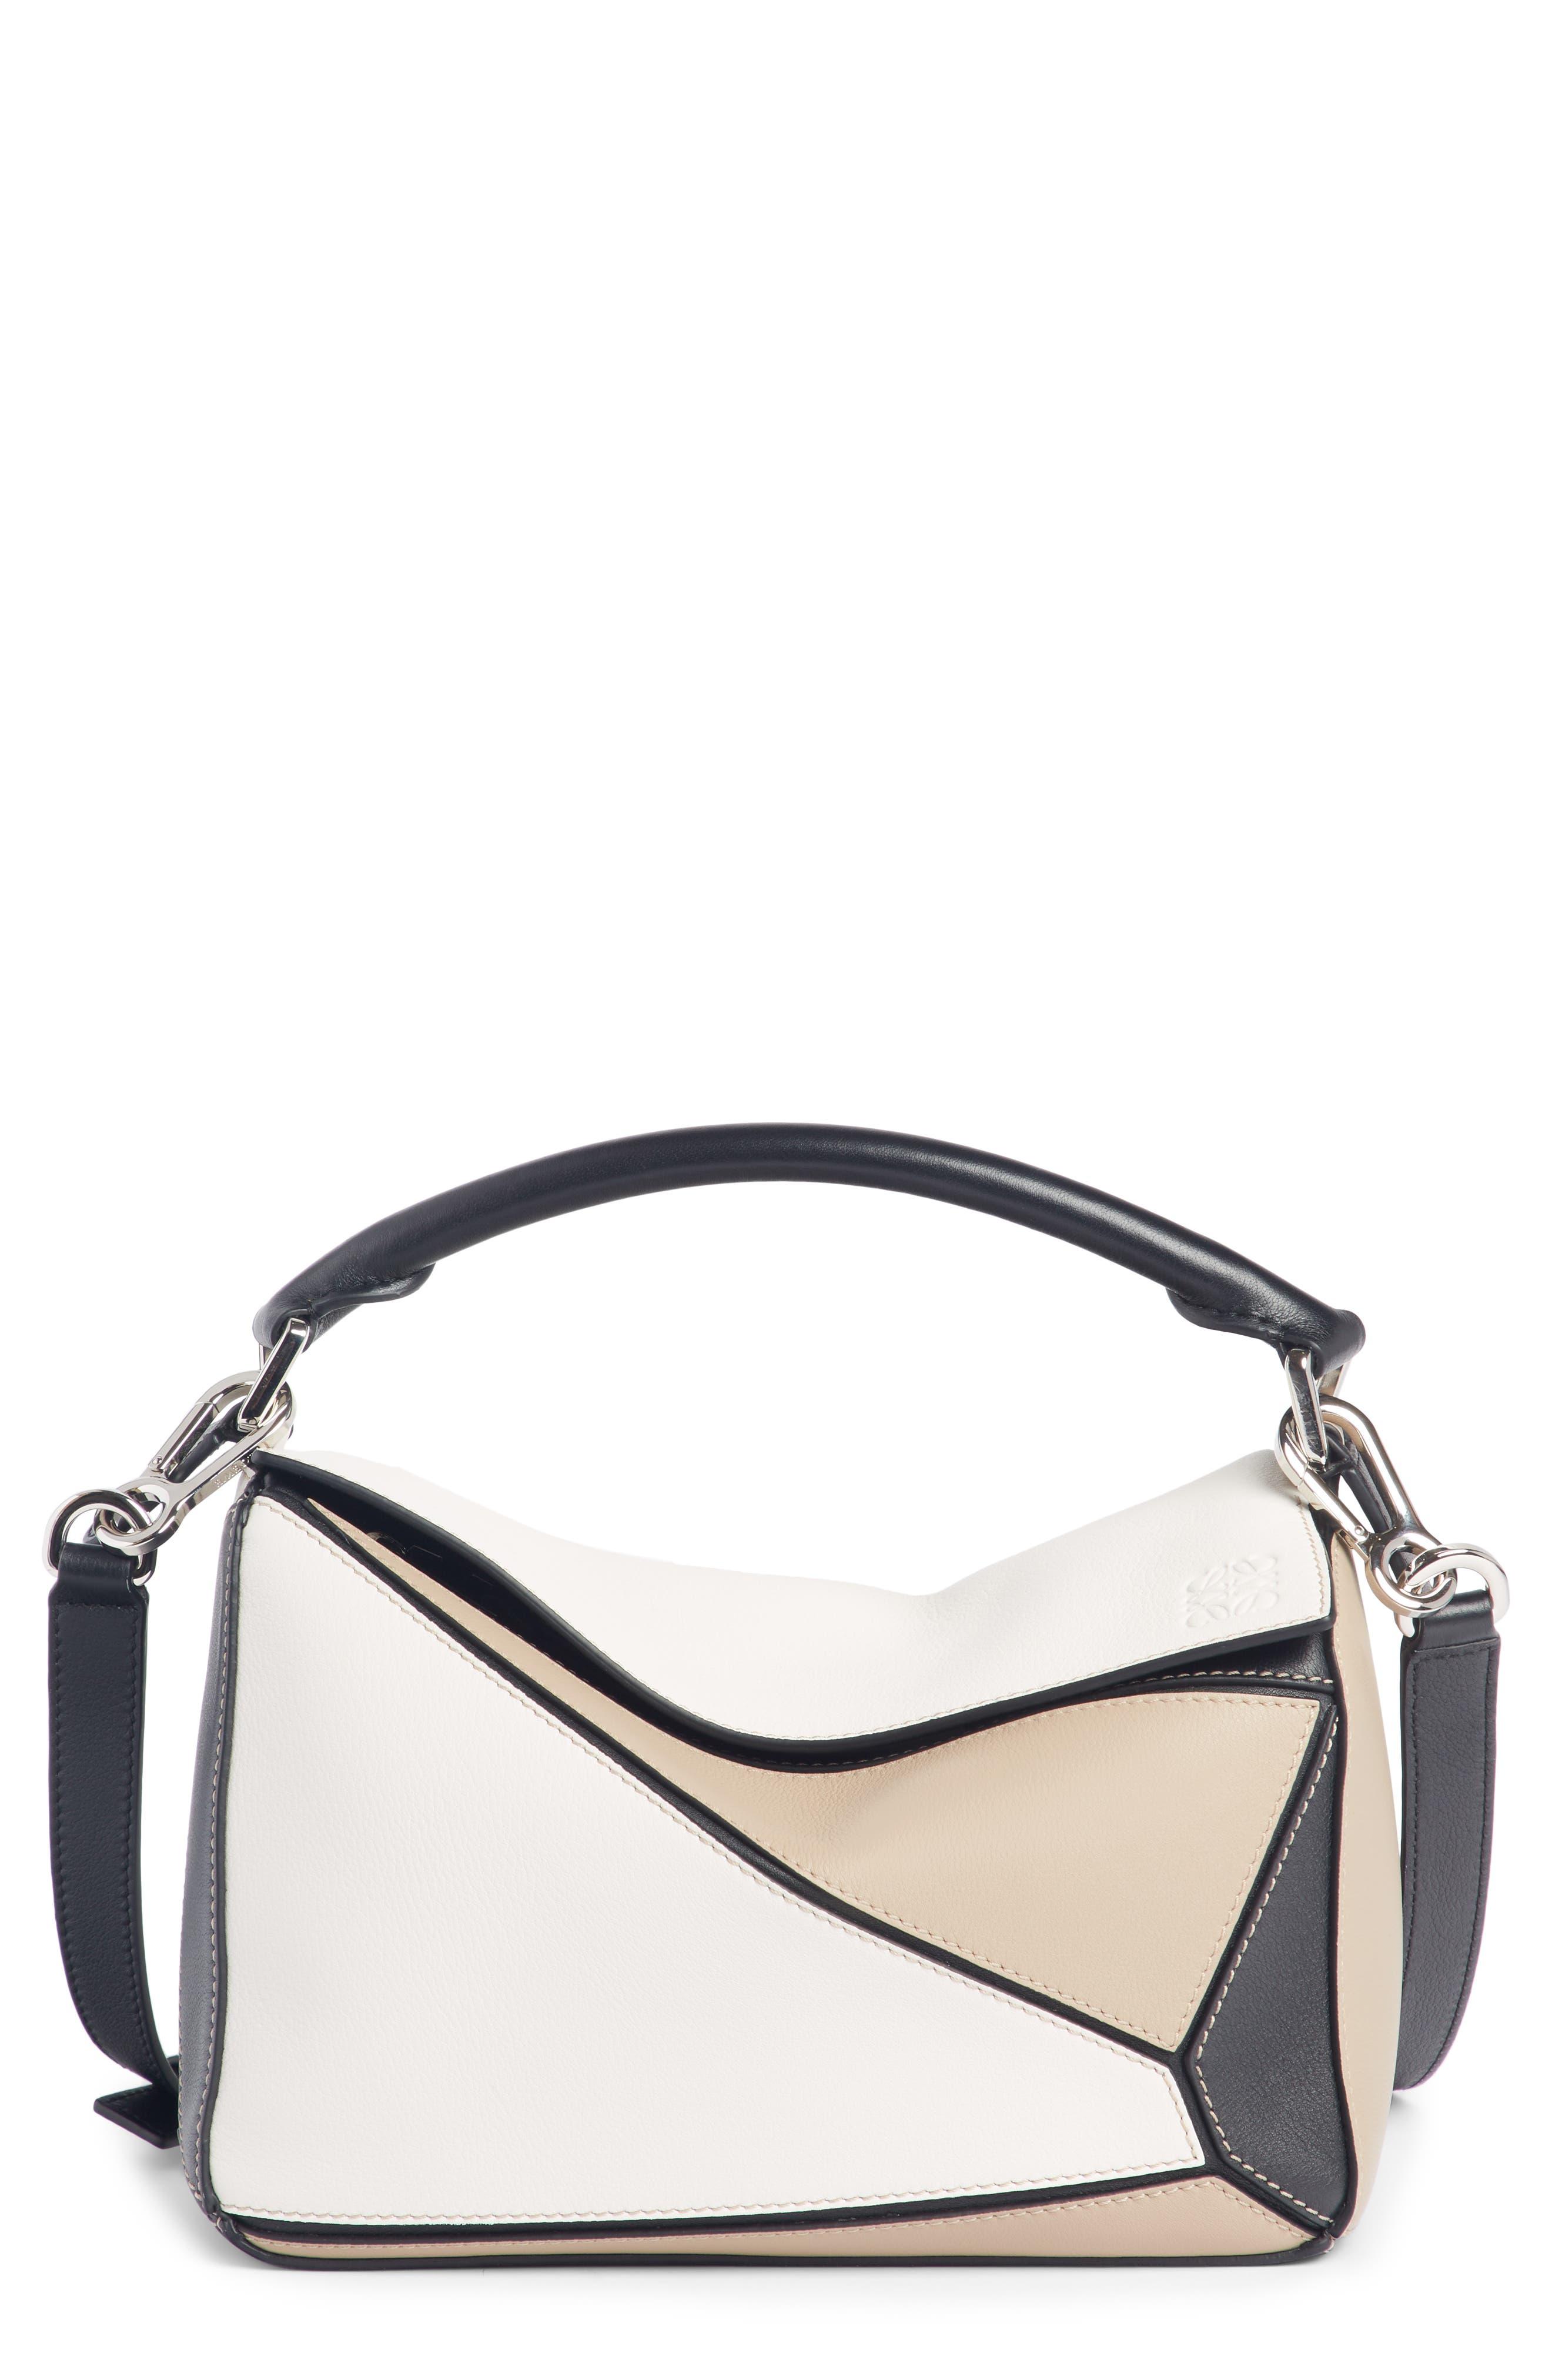 Puzzle Calfskin Leather Bag,                             Main thumbnail 1, color,                             Soft White/ Sand